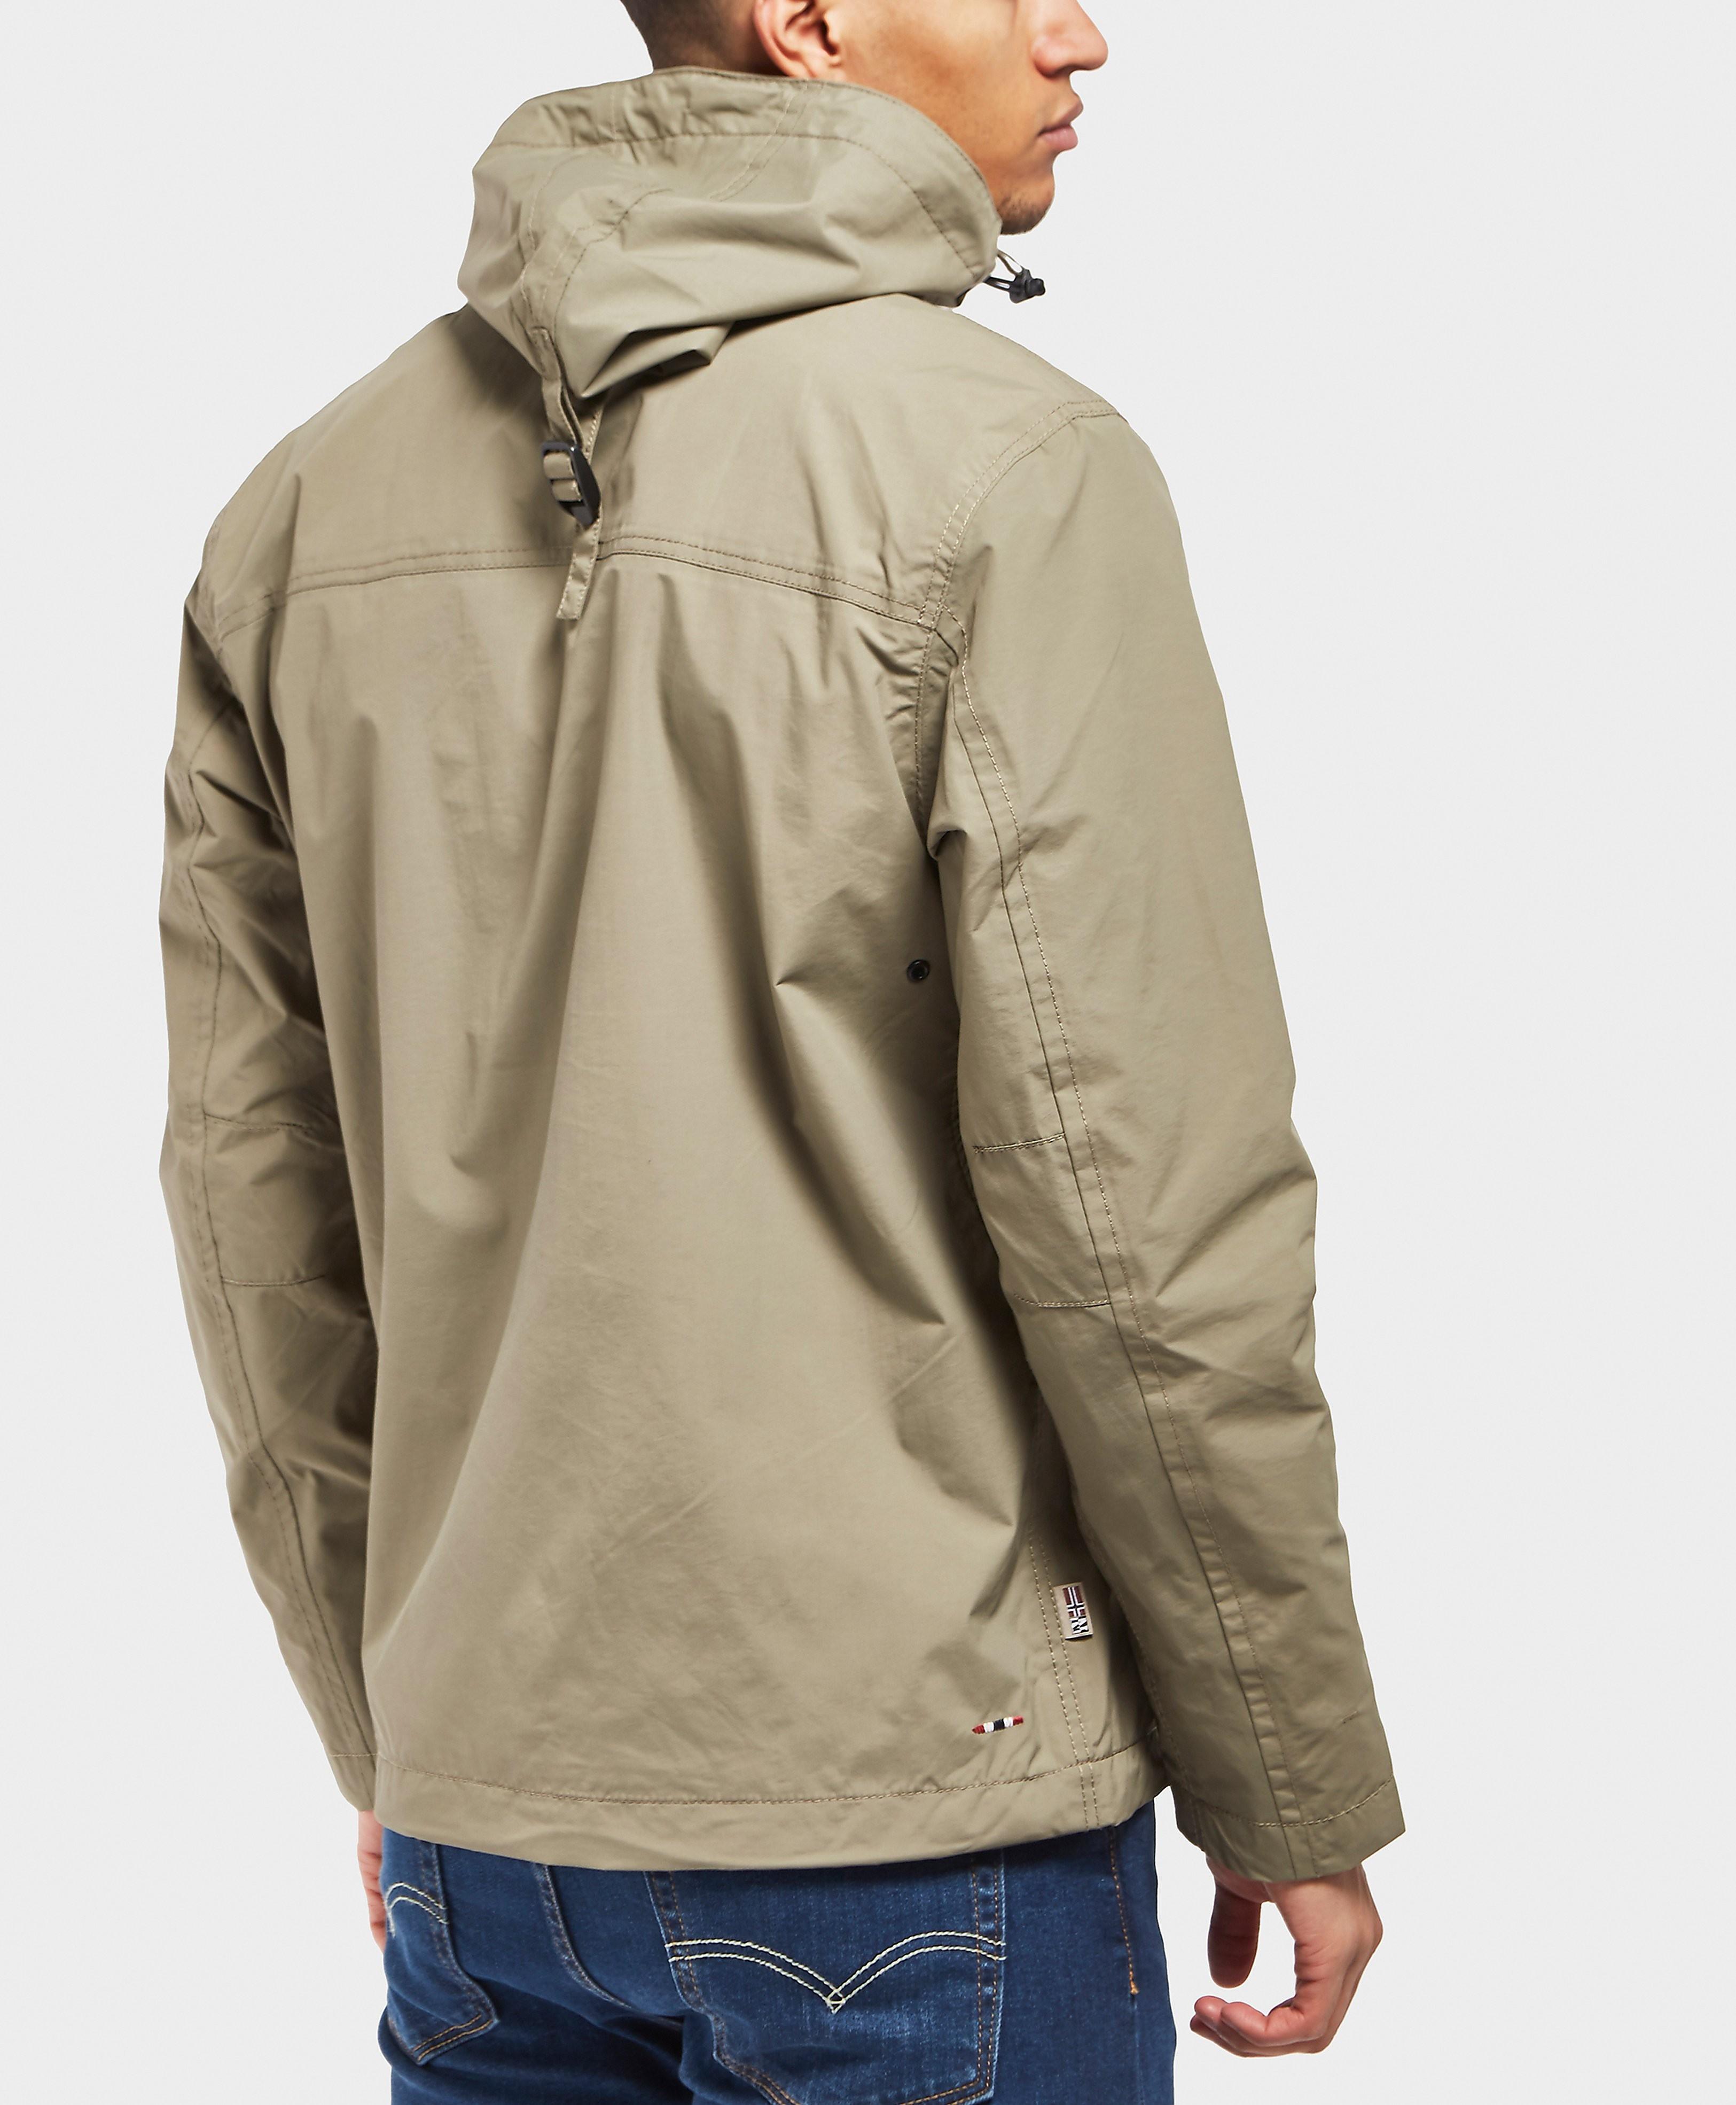 Napapijri Rainforest Lightweight Jacket